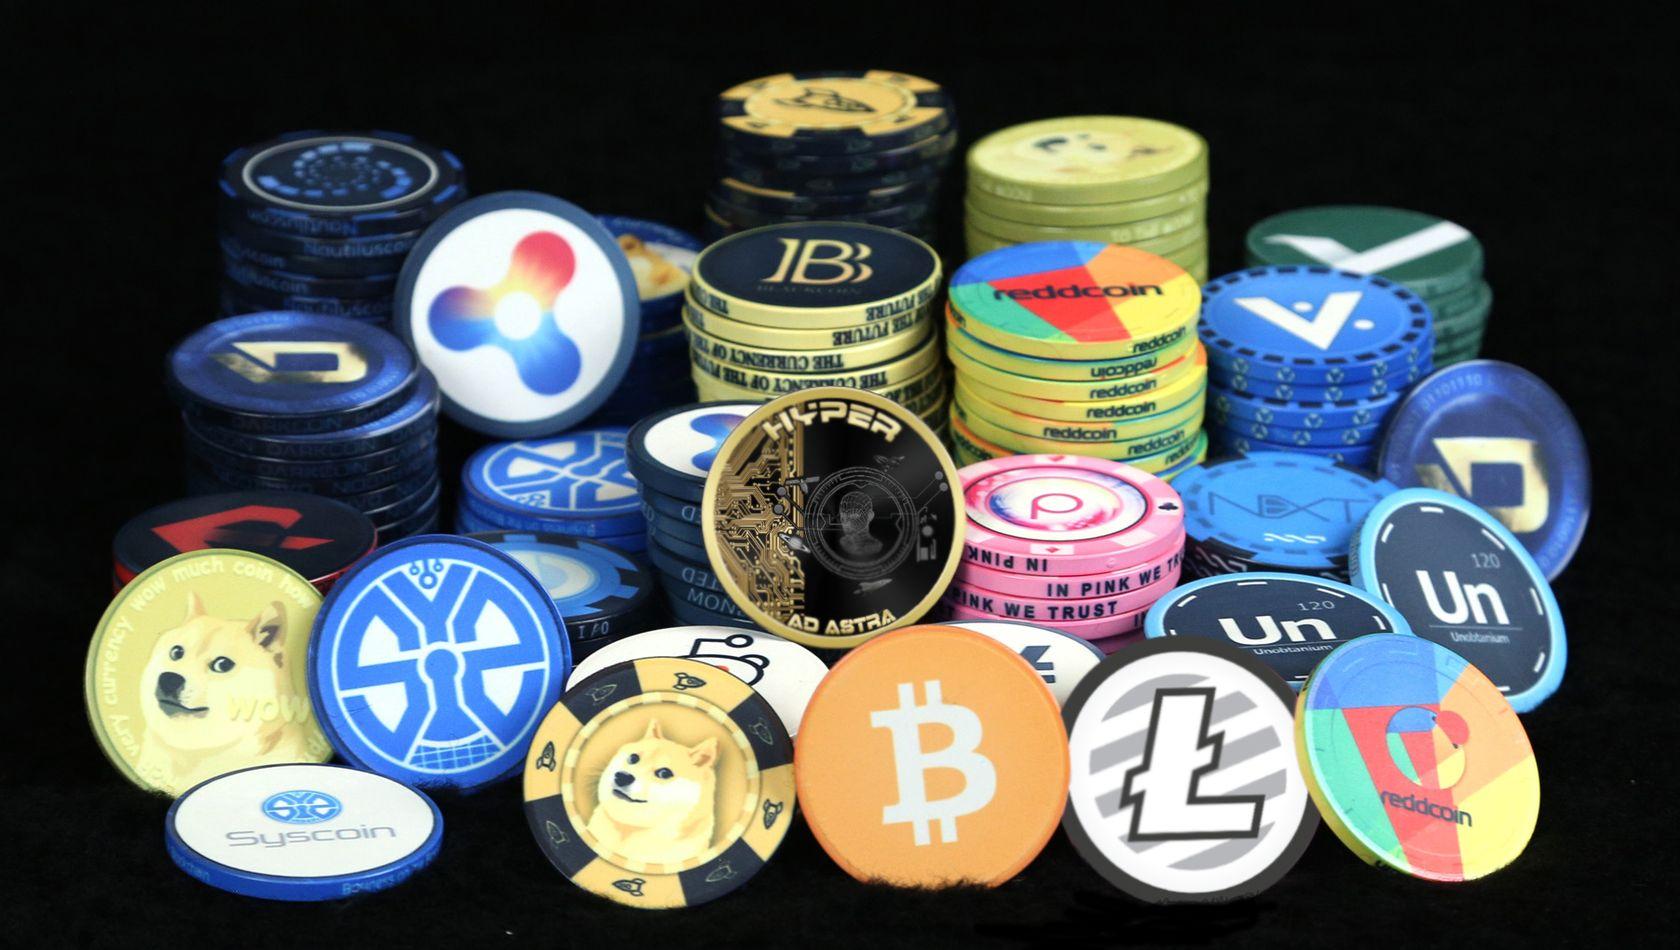 [Ghid complet] Cum cumperi monede virtuale gen IOTA, Ripple, Stellar Lumens, Ethereum sau Bitcoin